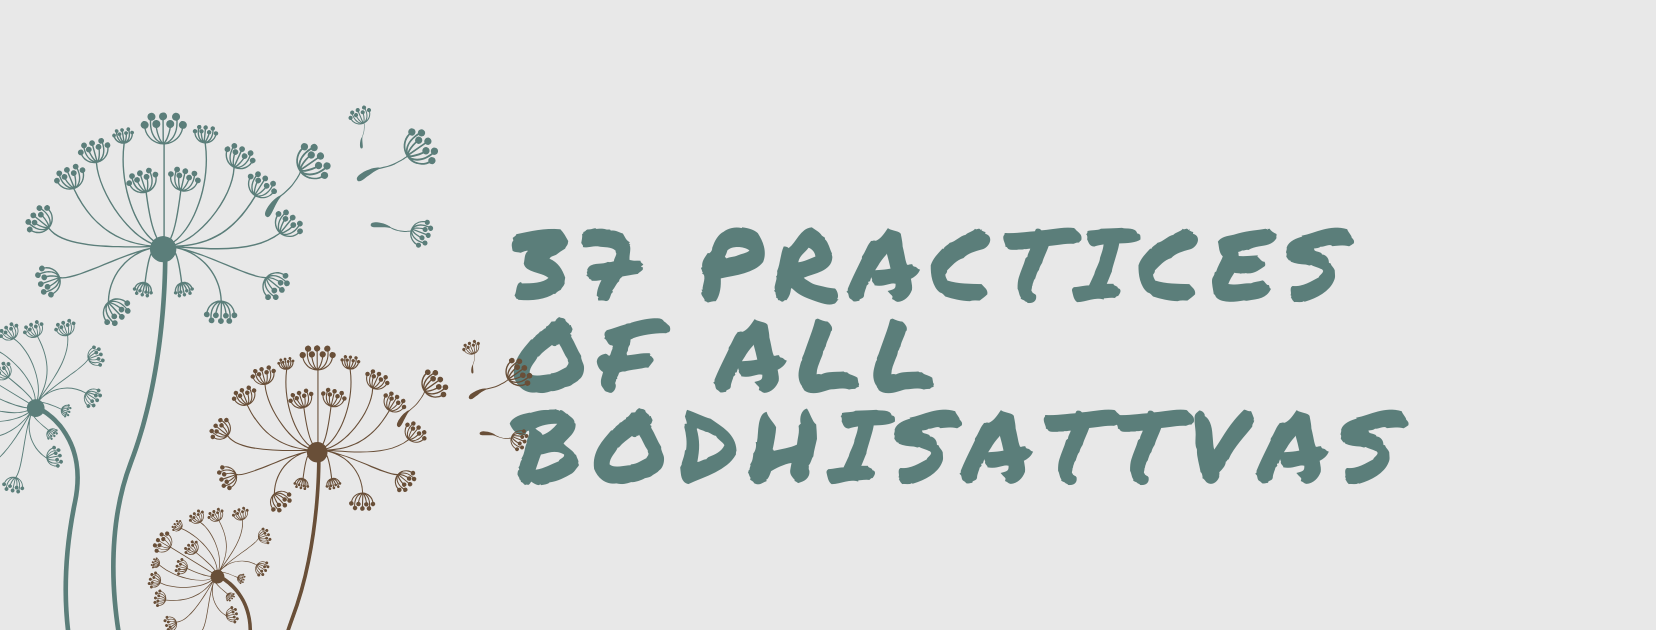 37 practices of all bodhisattvas